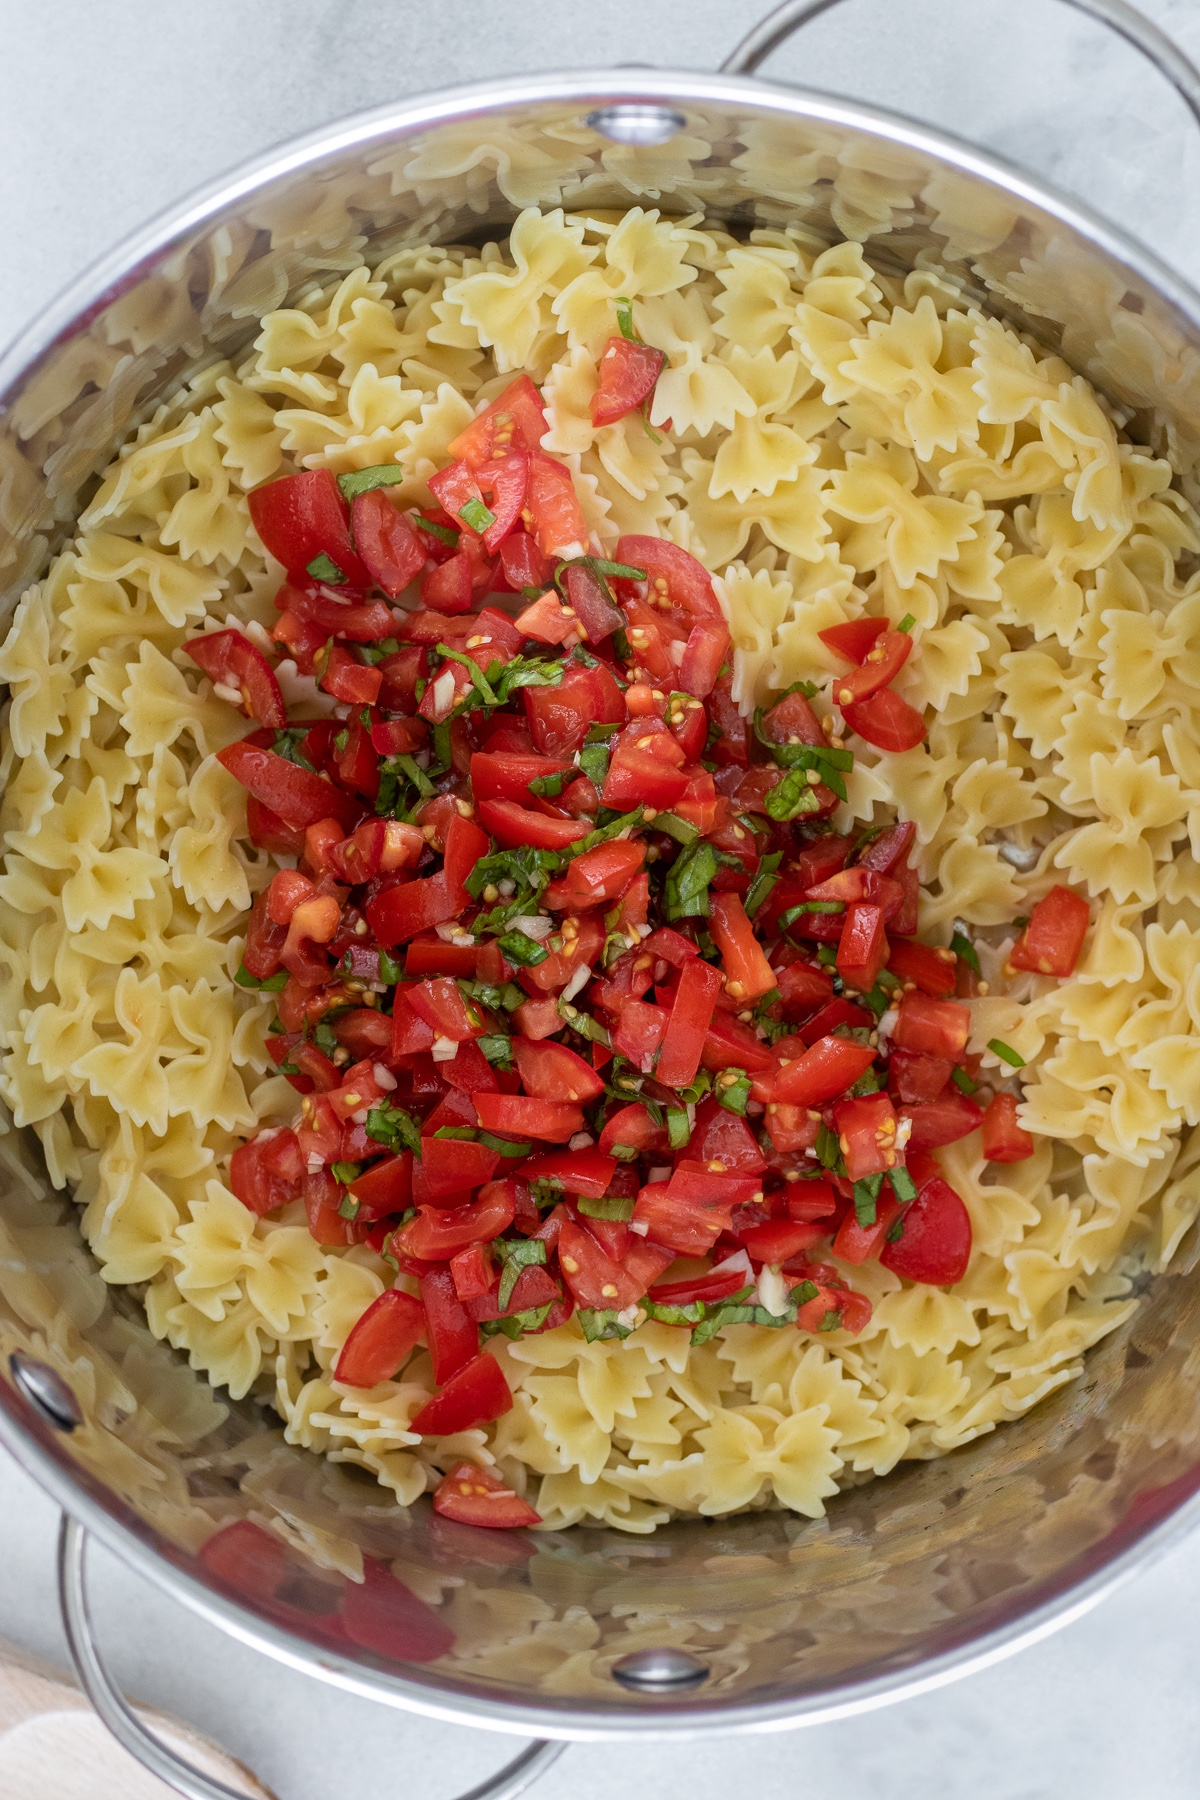 Add bruschetta to the cooked pasta